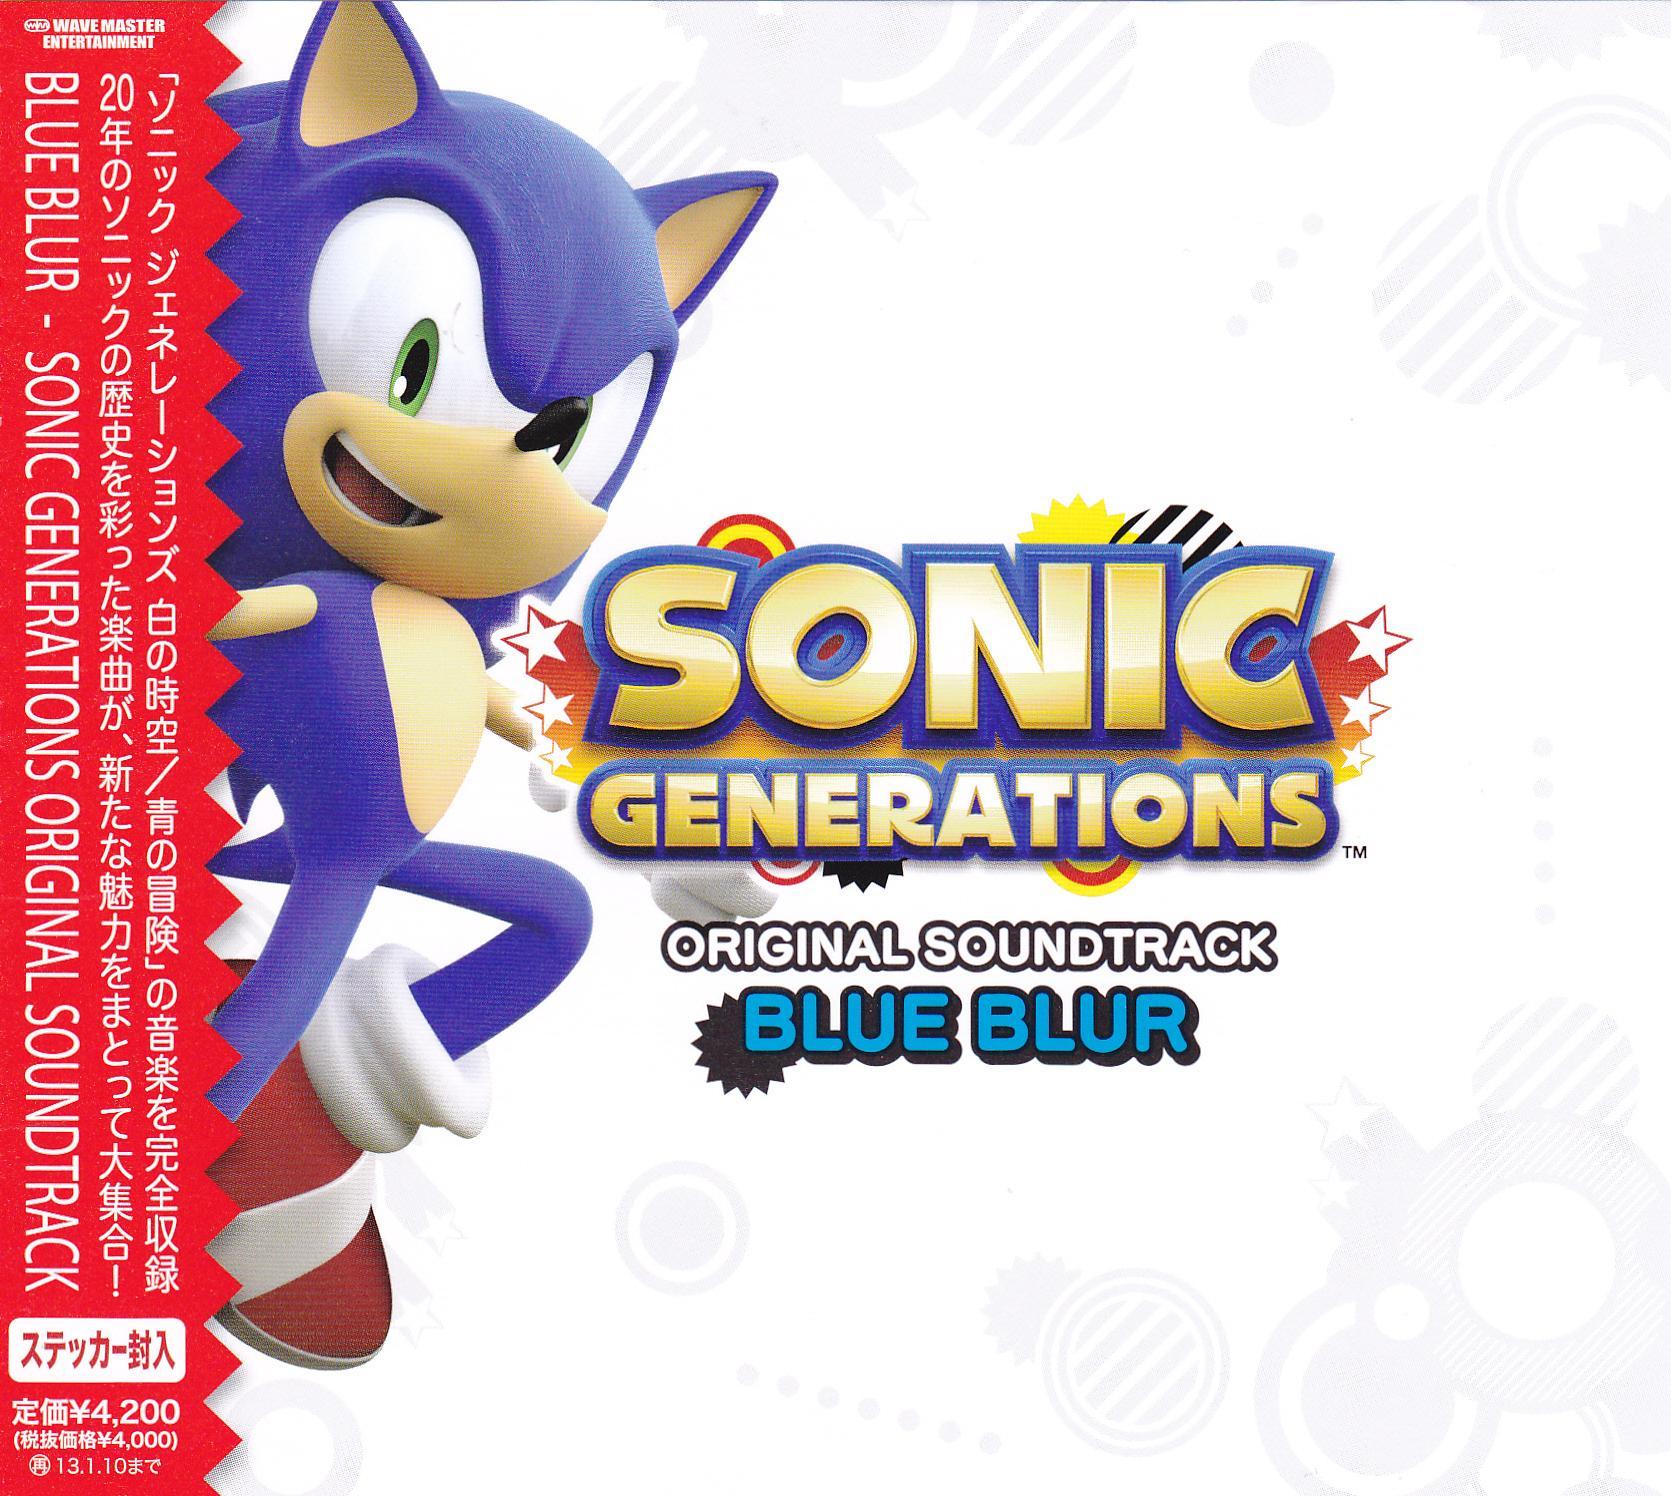 Cd clipart soundtrack. Blue blur sonic generations